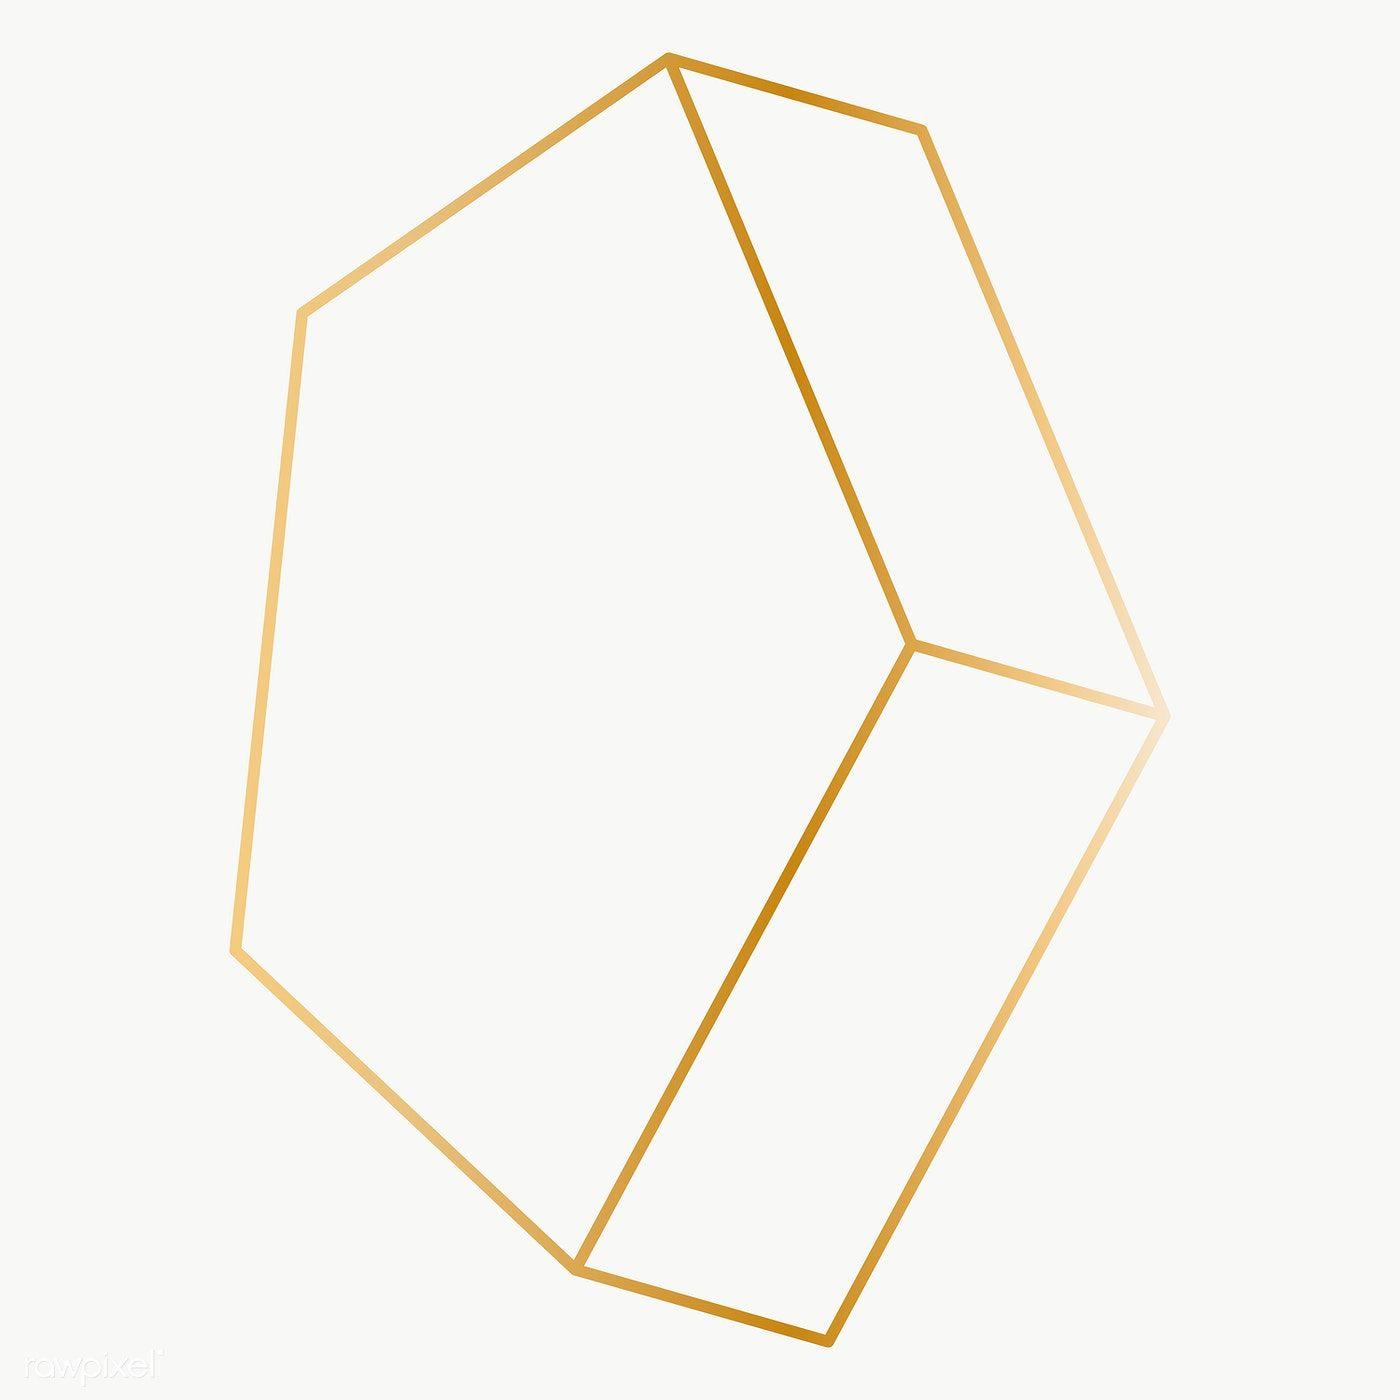 Minimal Gold Pentagonal Prism Shape Transparent Png Free Image By Rawpixel Com Katie Vector Background Pattern Shapes Prism Pattern